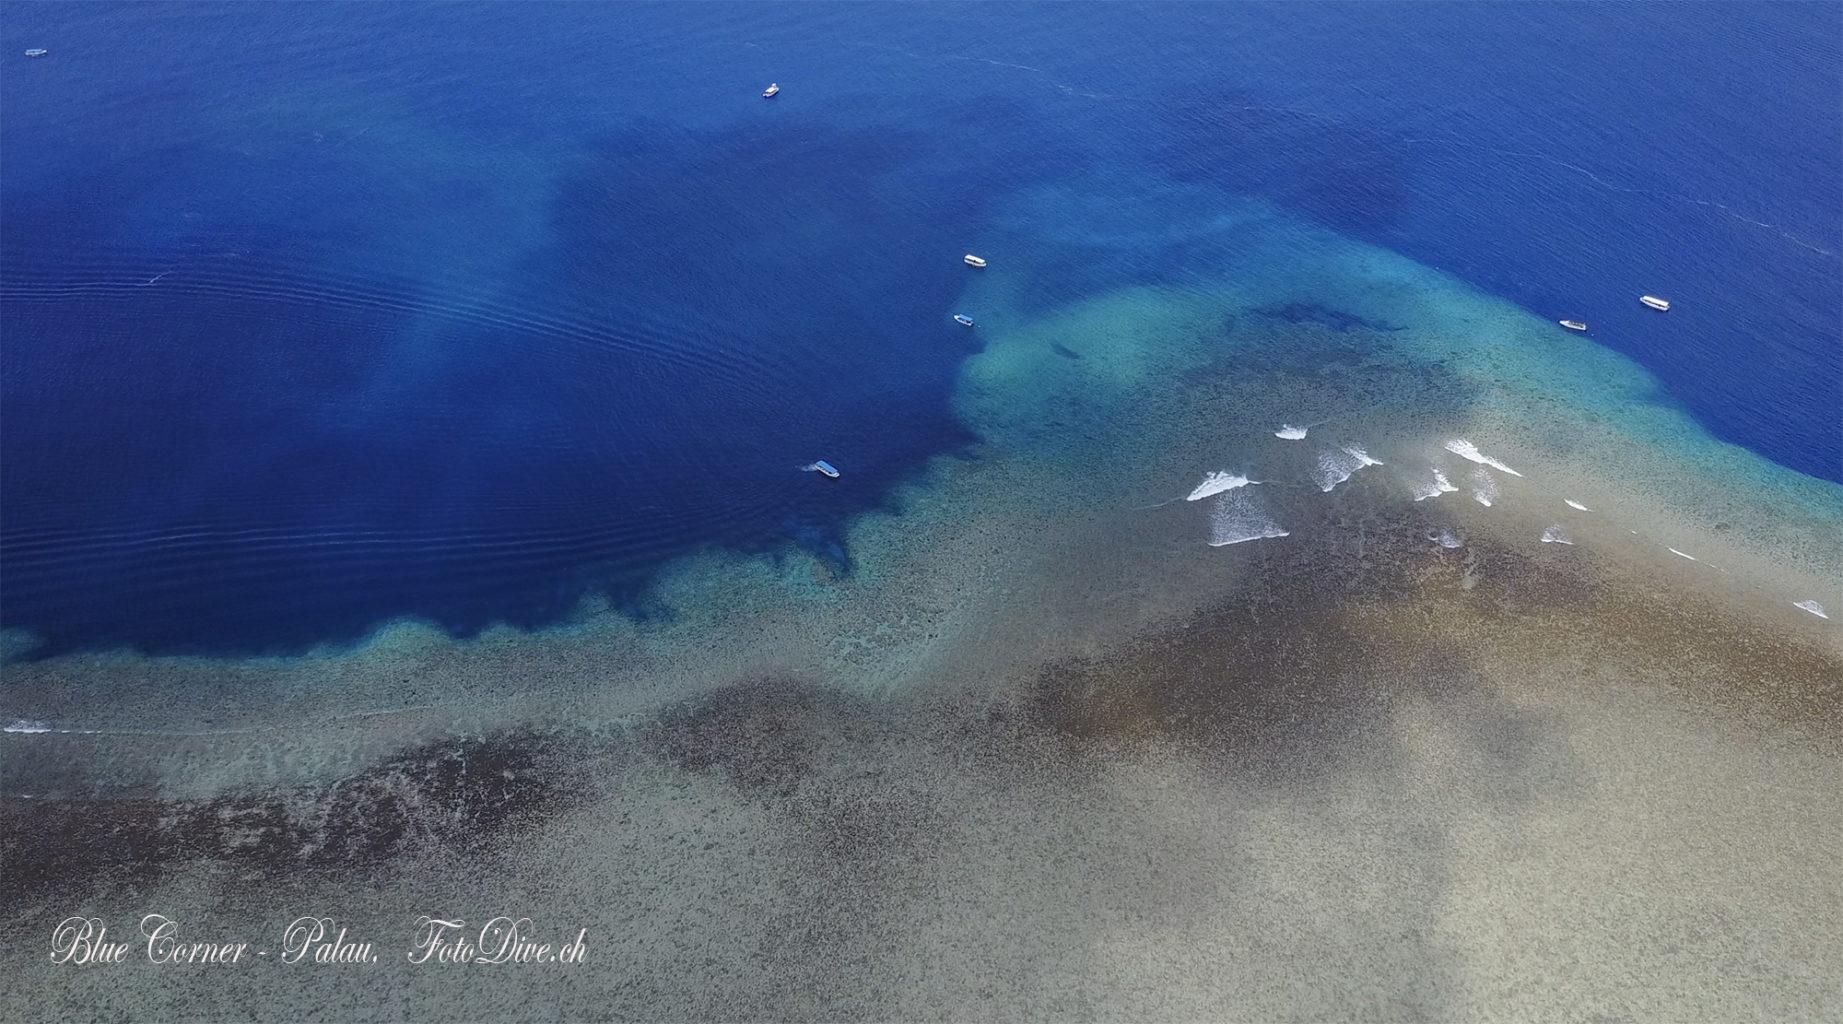 Blue Corner Drone Image Palau